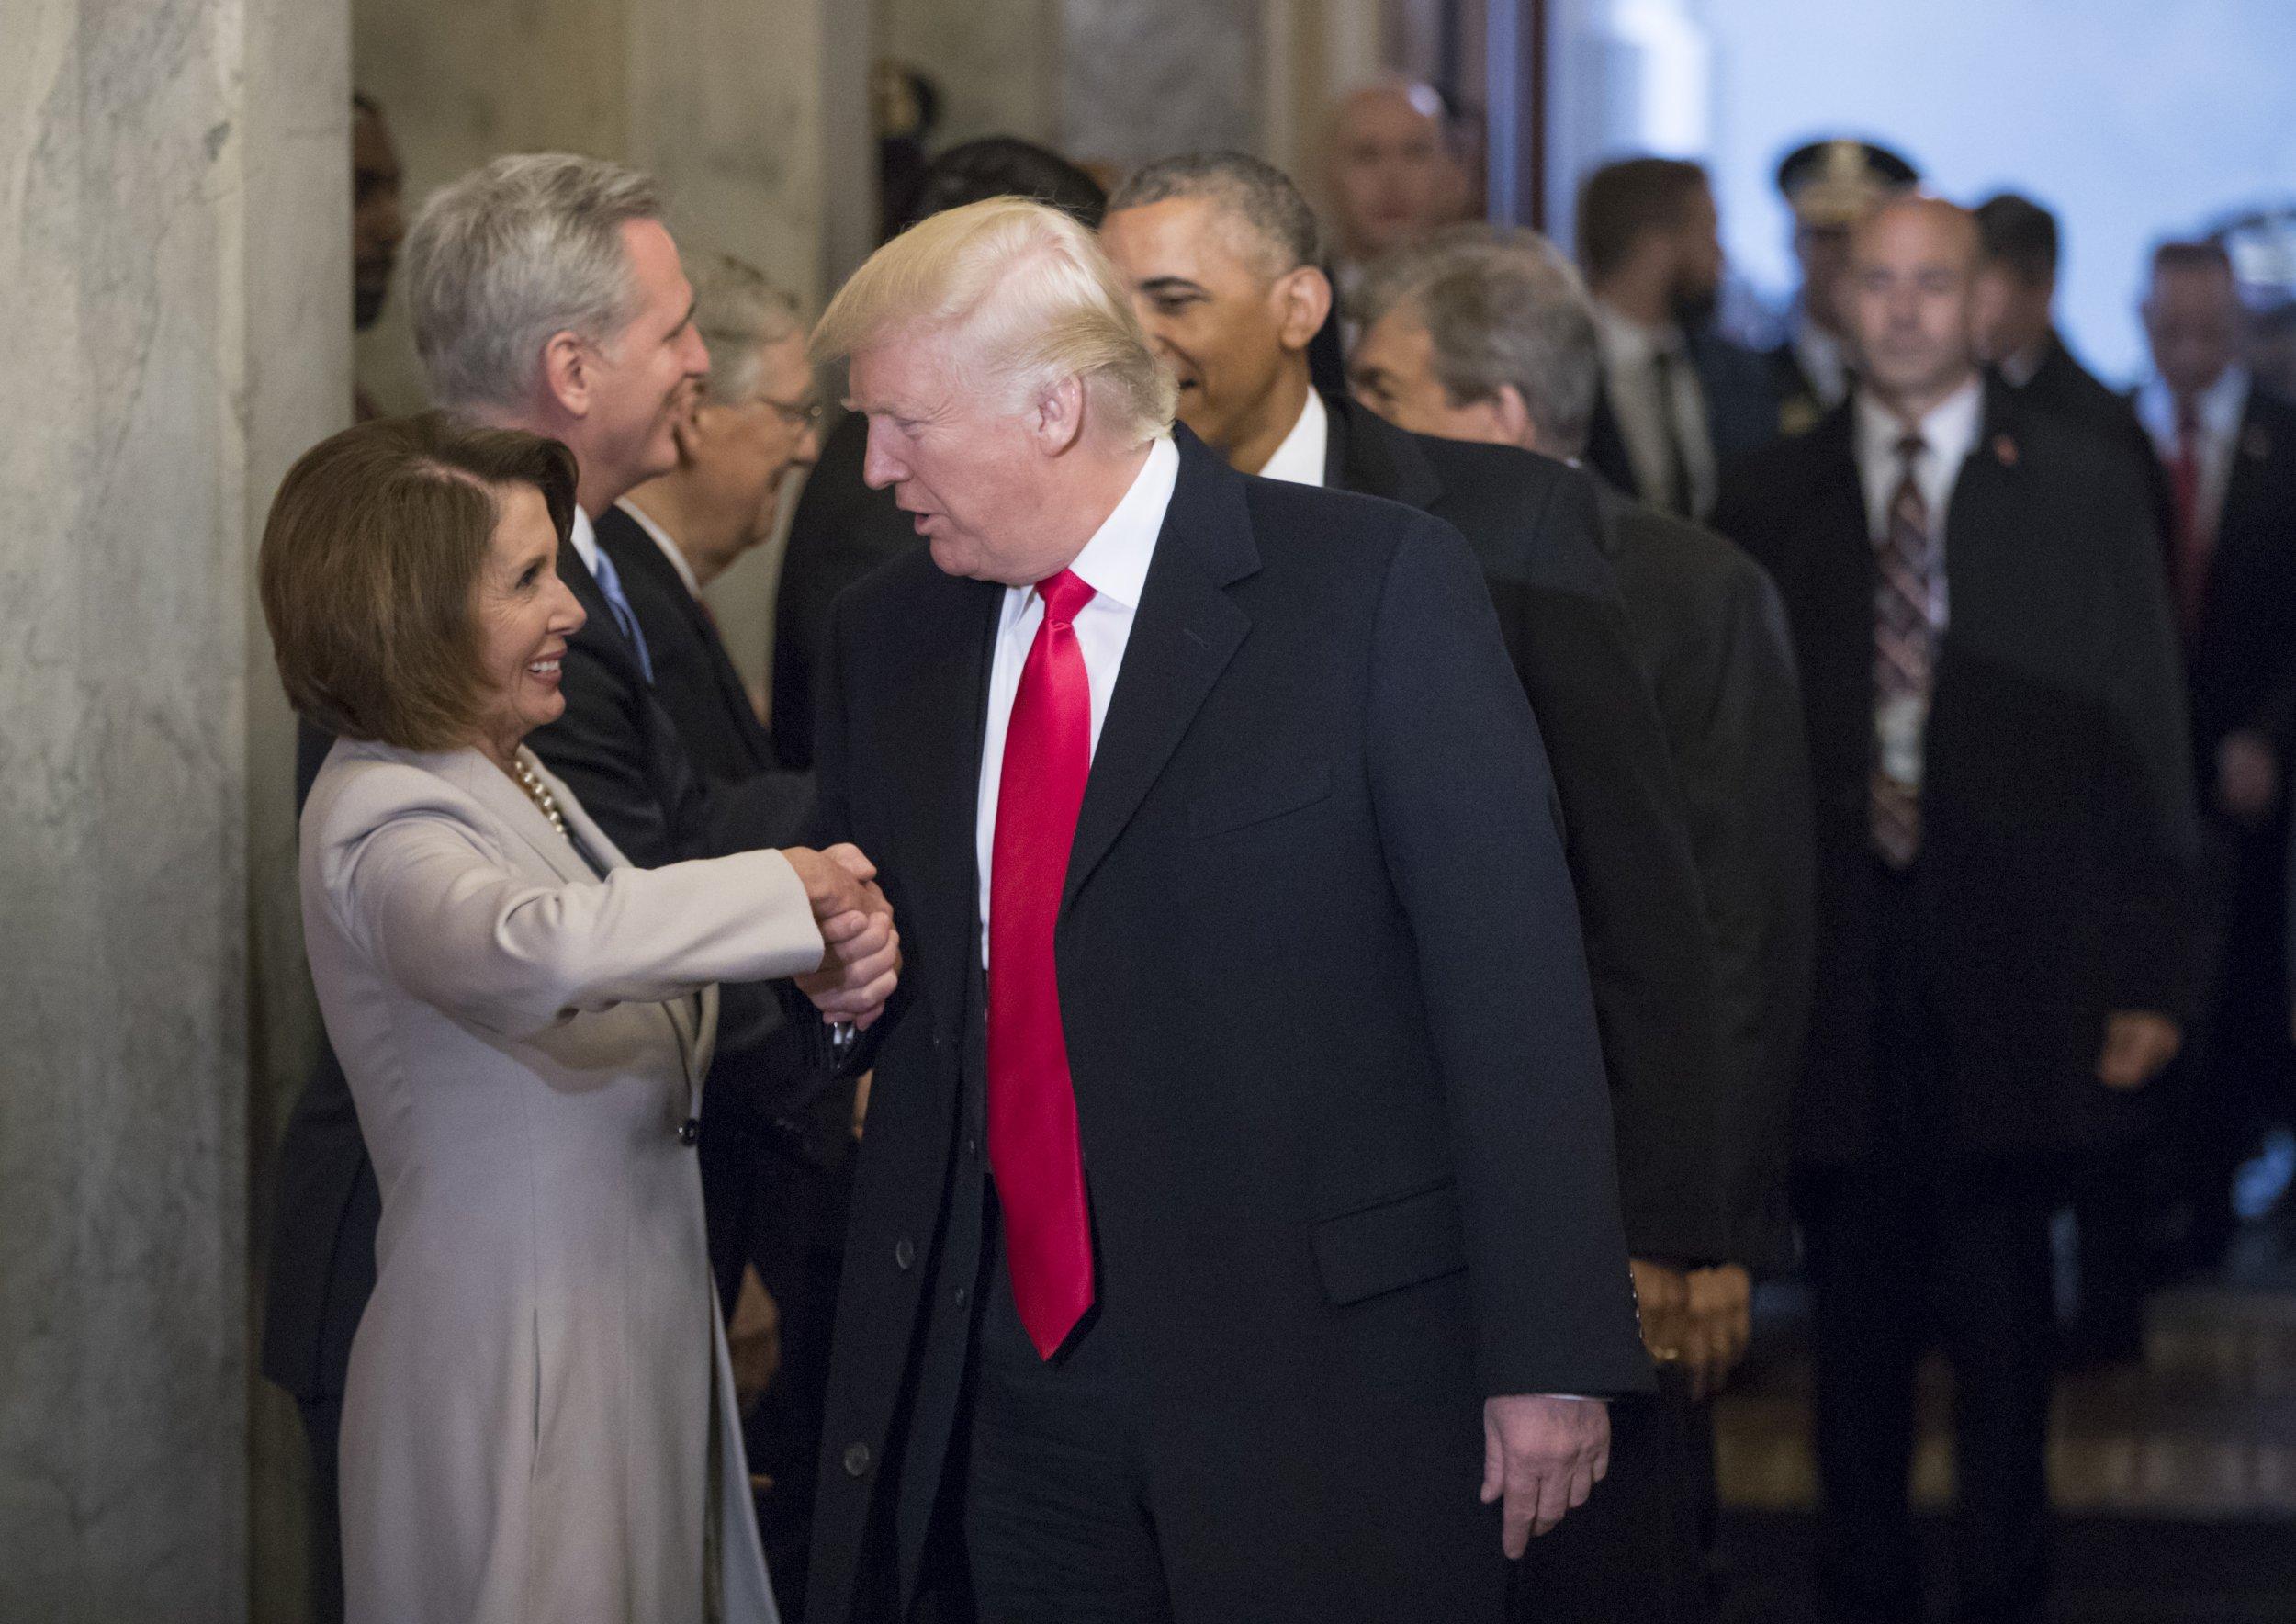 DemocratsApprovalRatingPelosiTrump